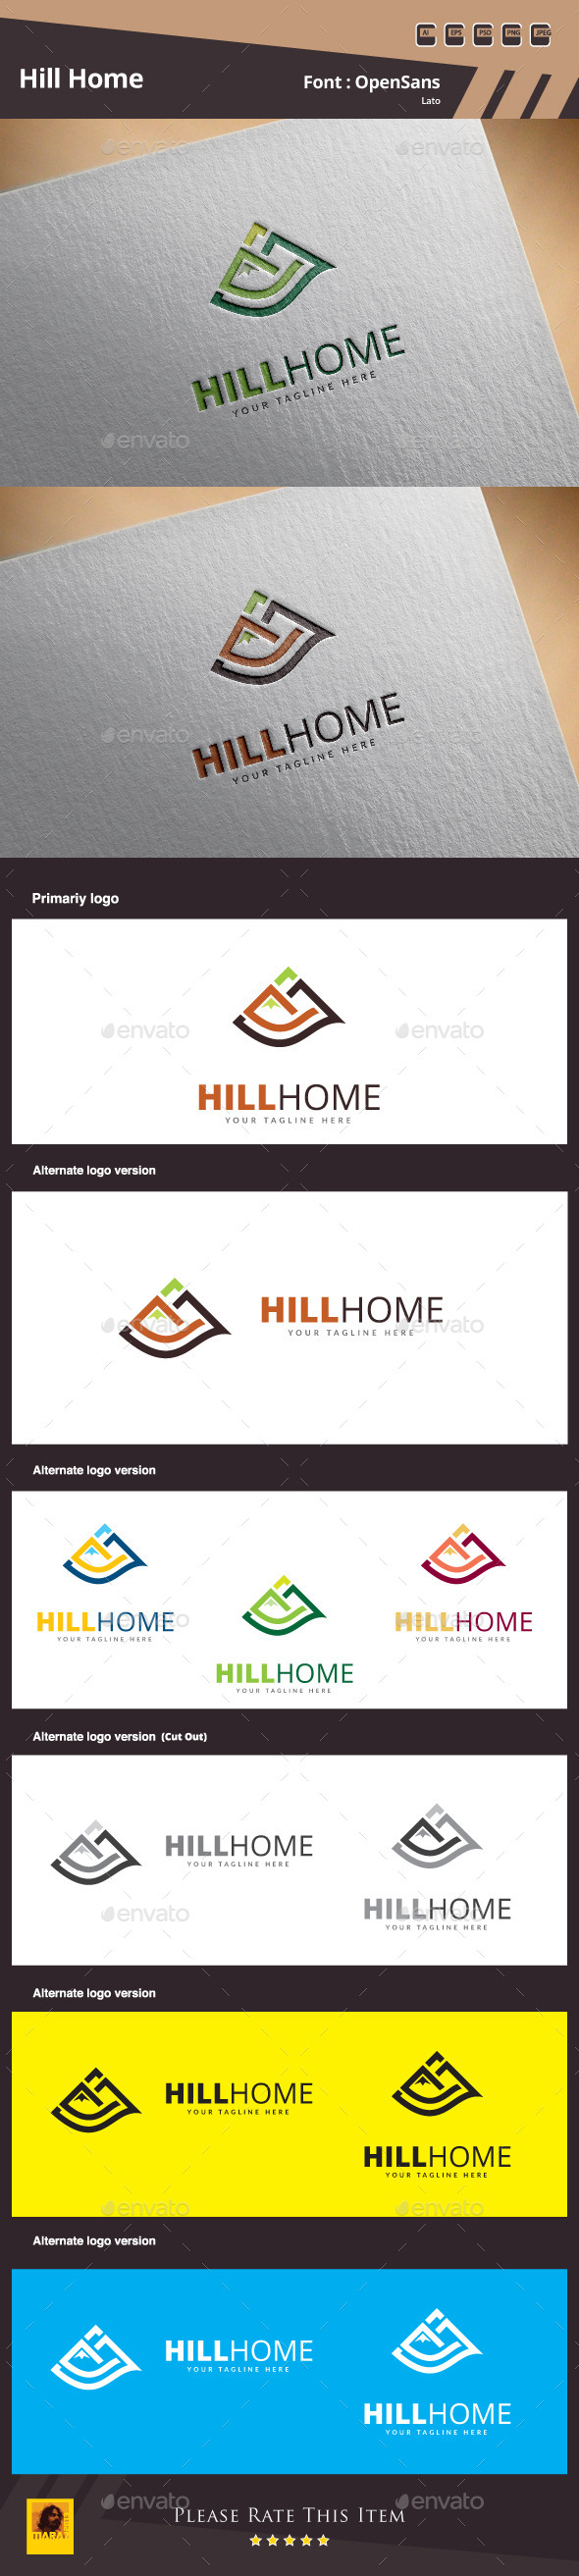 GraphicRiver Hill Home Logo Template 10562527